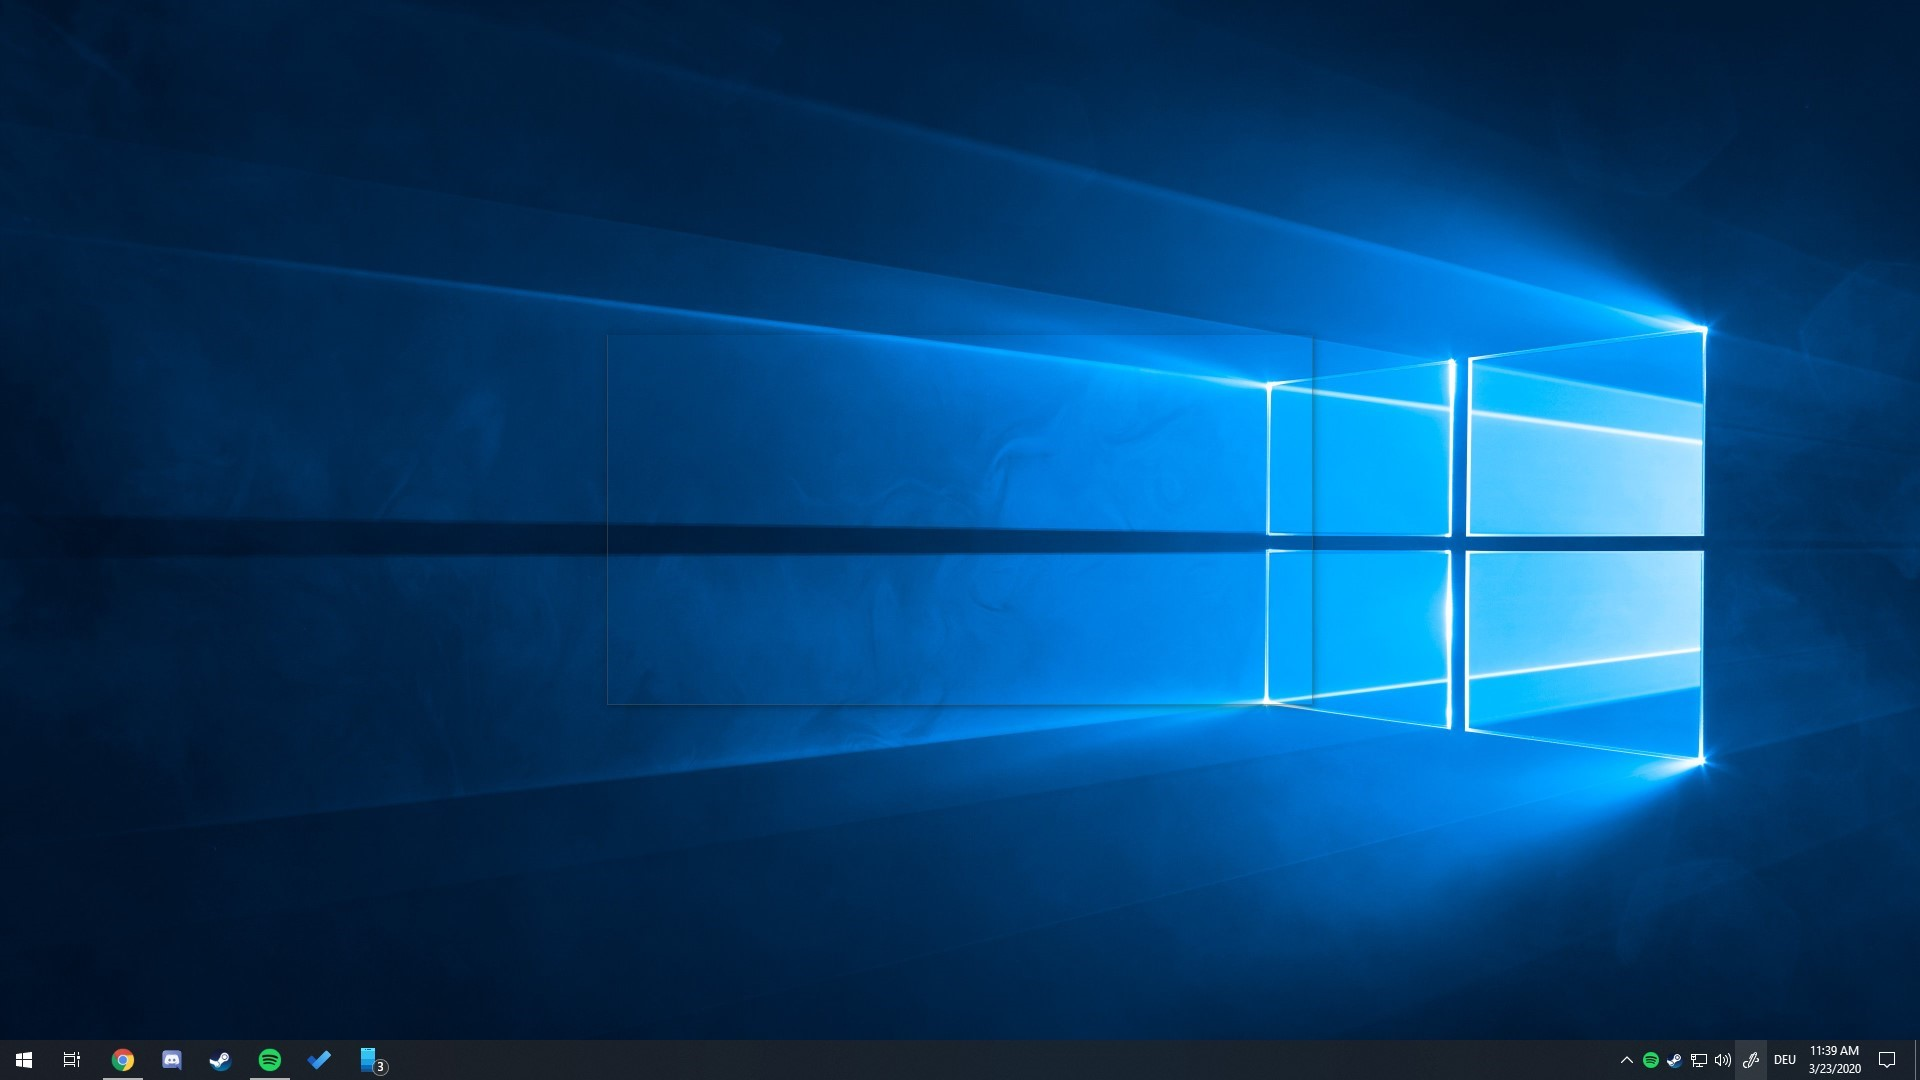 Transparentes Rechteck auf Desktop